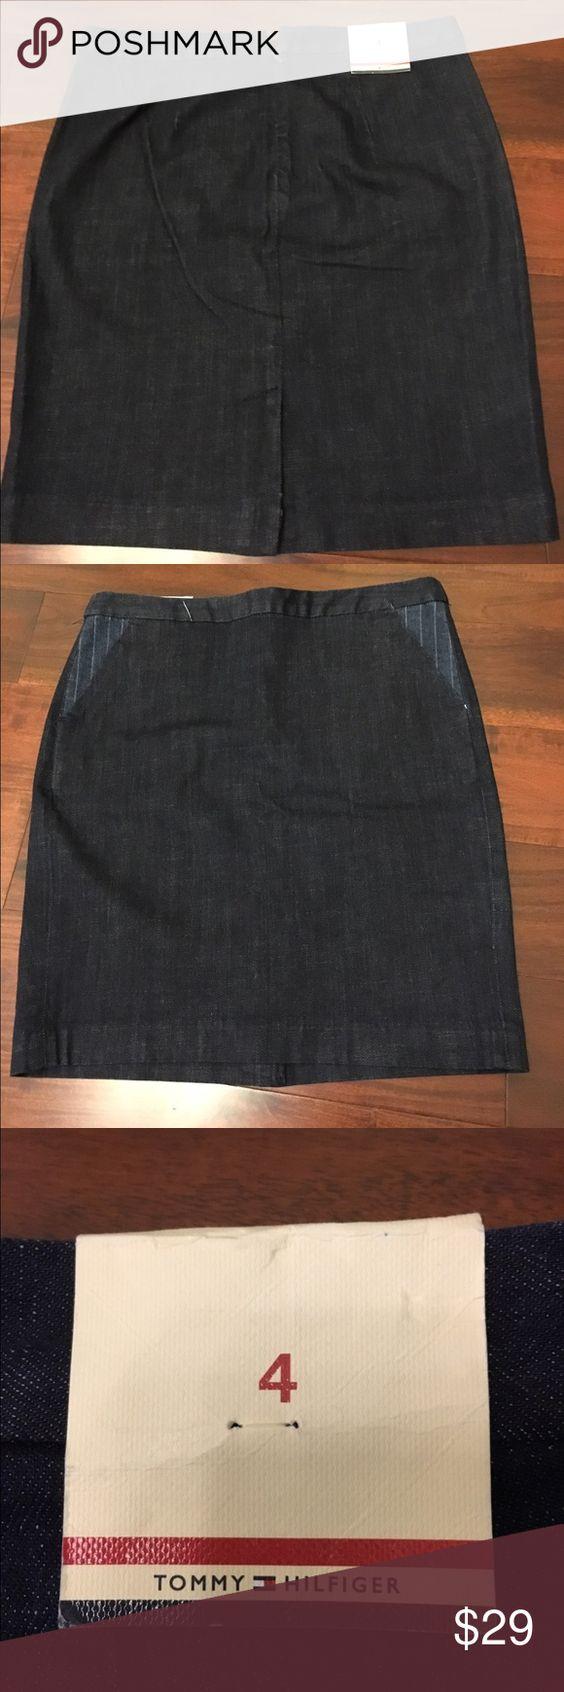 Tommy Hilfiger Denim Skirt -size 4 NWT